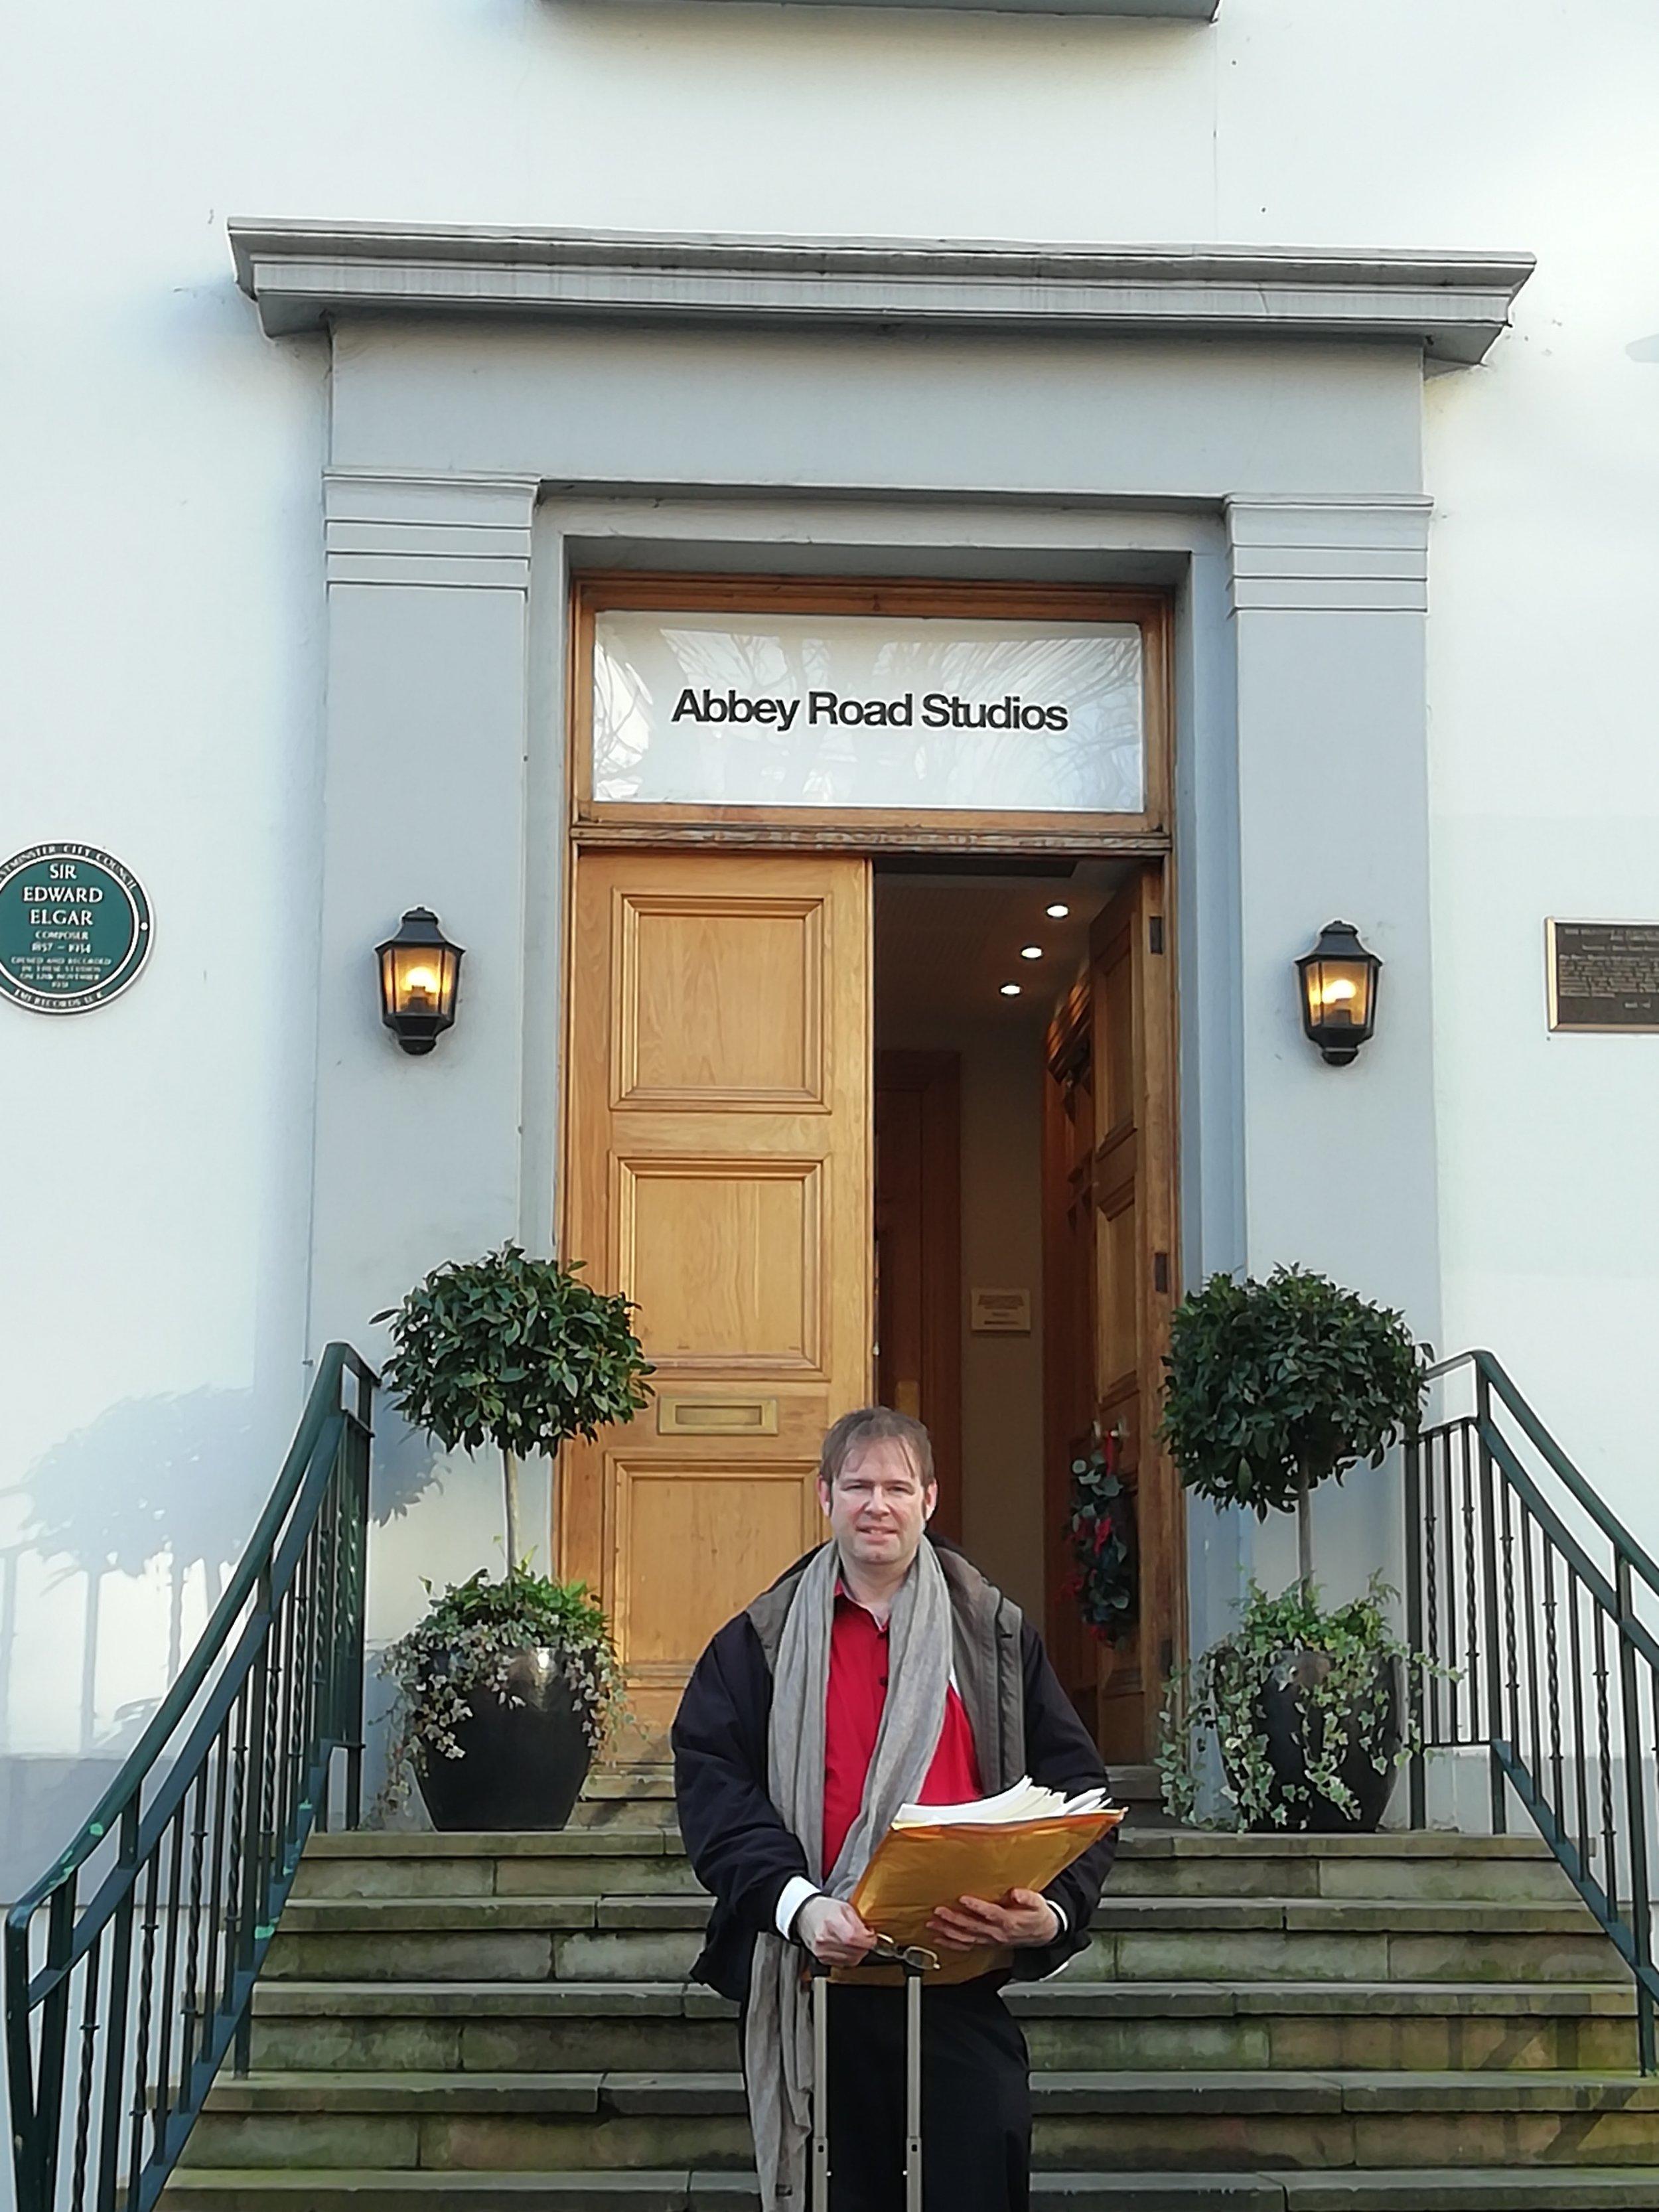 Kaska at Abbey Road Studios